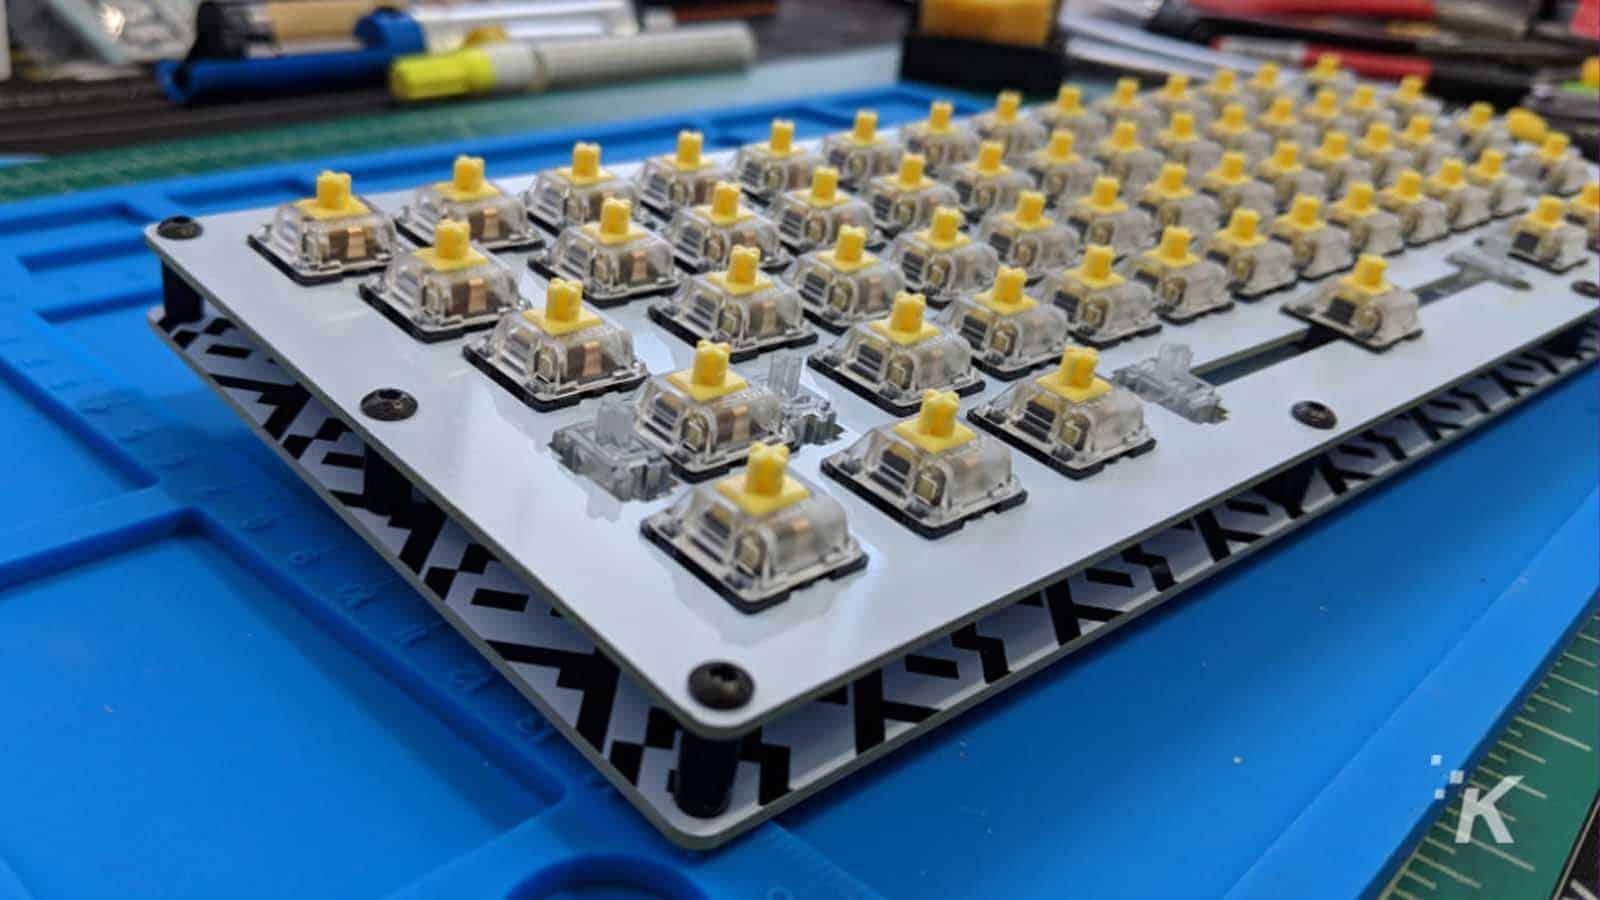 mechanical keyboard guts